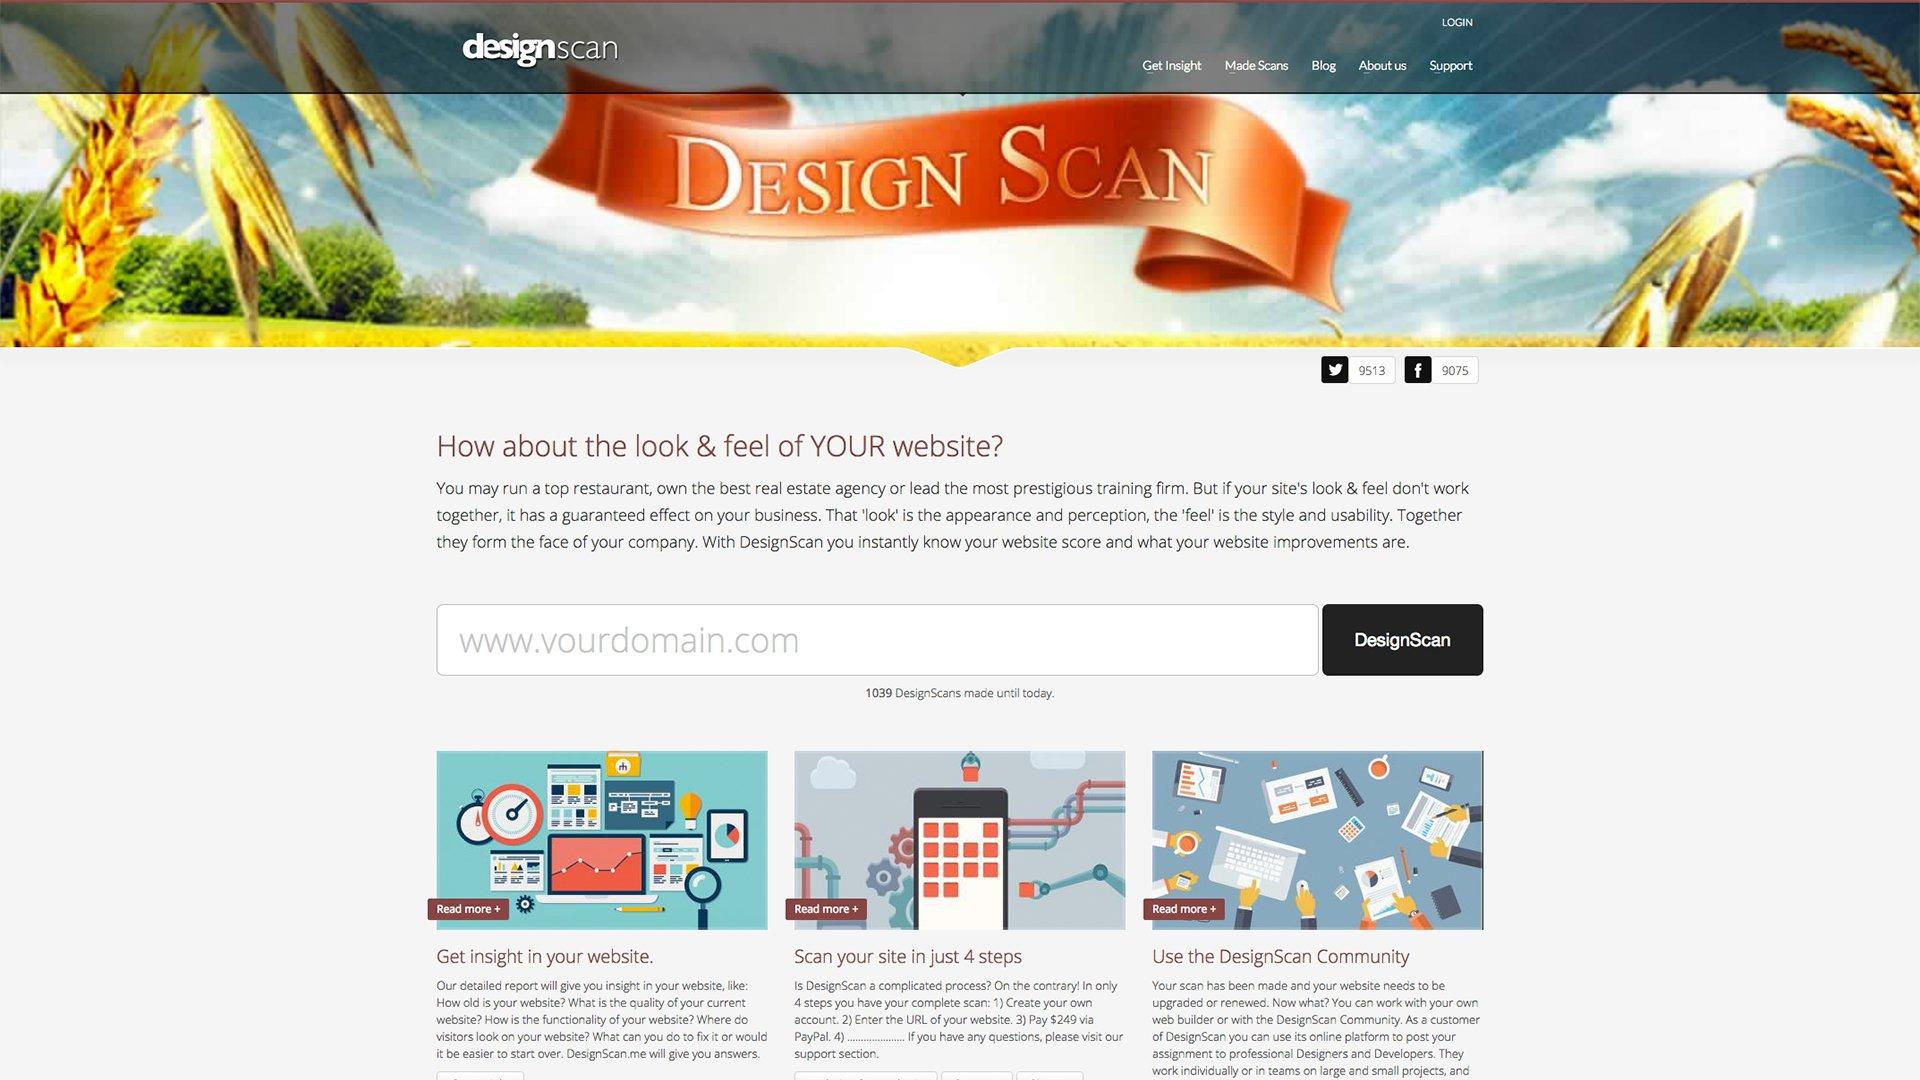 DesignScan